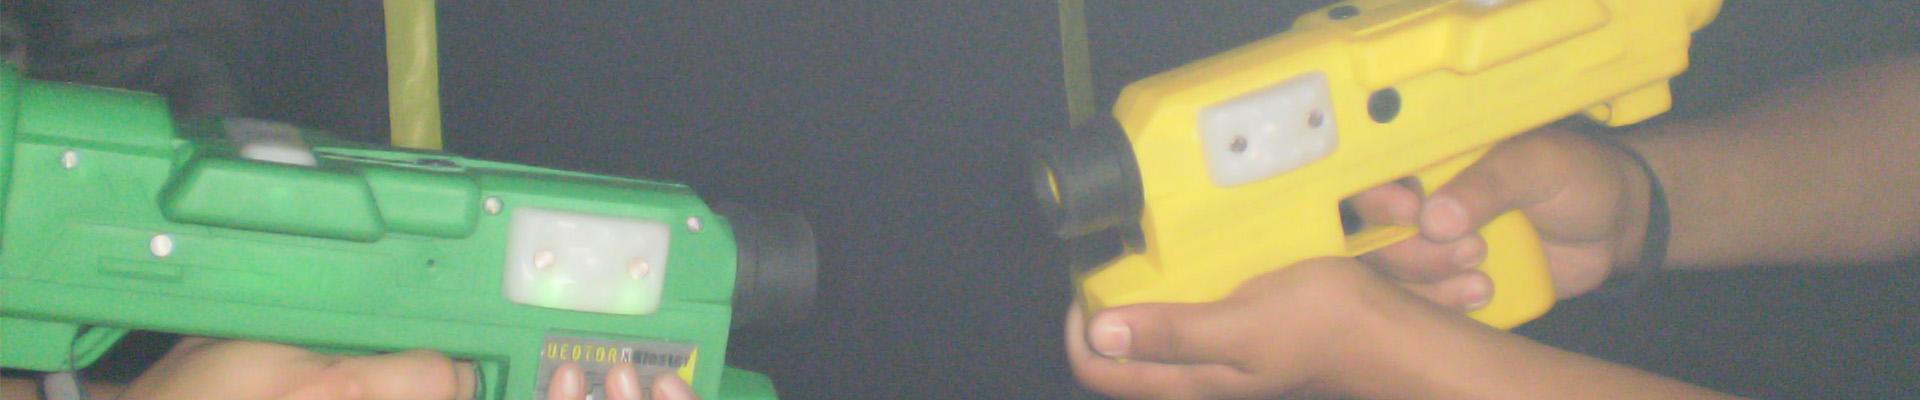 Blackbeard's » Xtreme Laser Tag